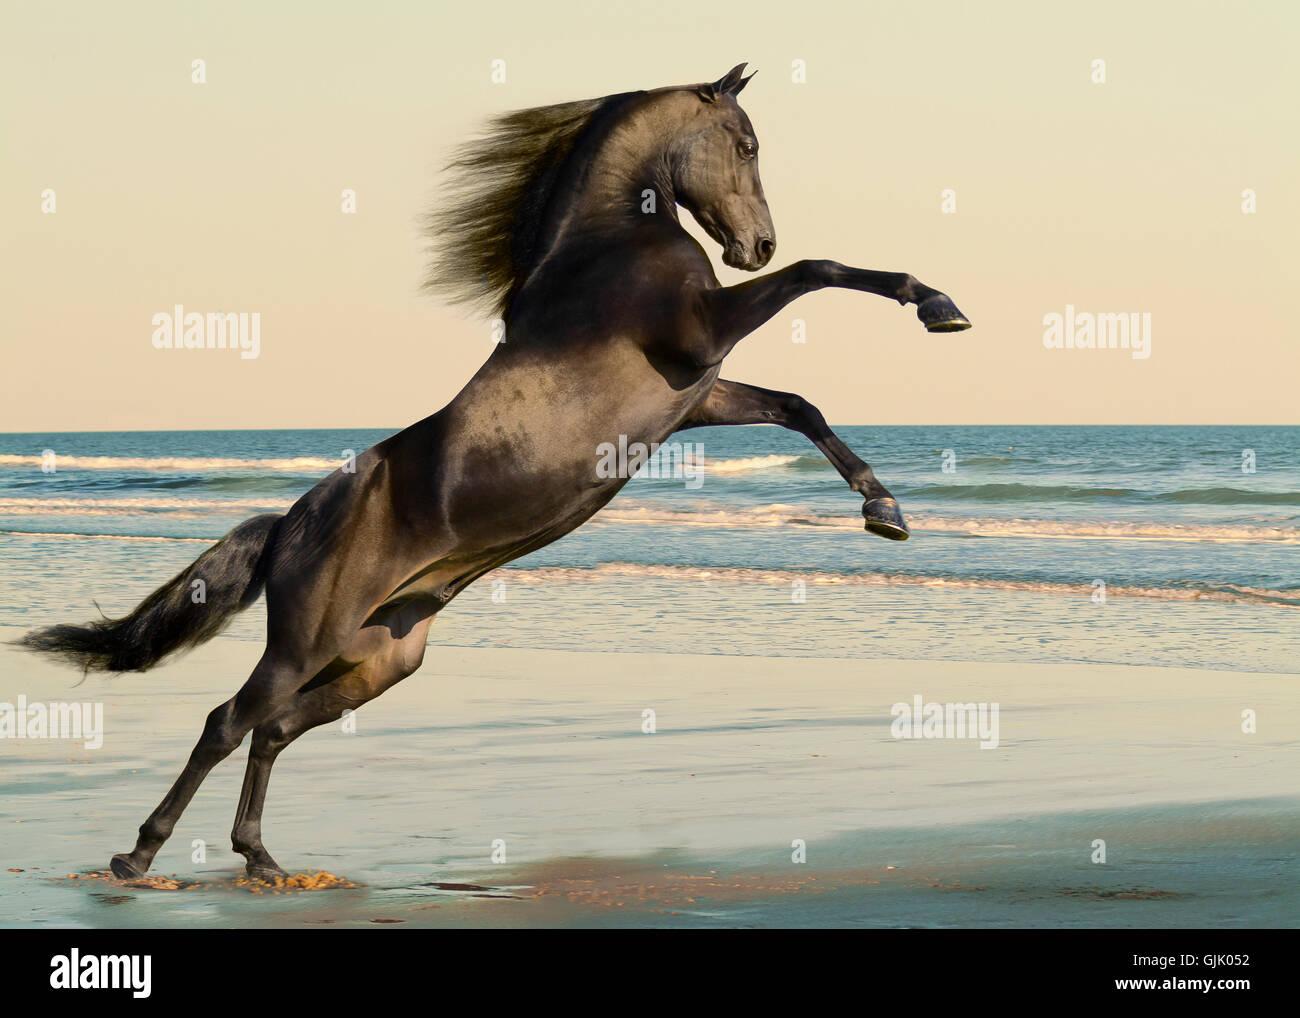 Balck Morgan horse stallion rearing up on ocean beach. - Stock Image